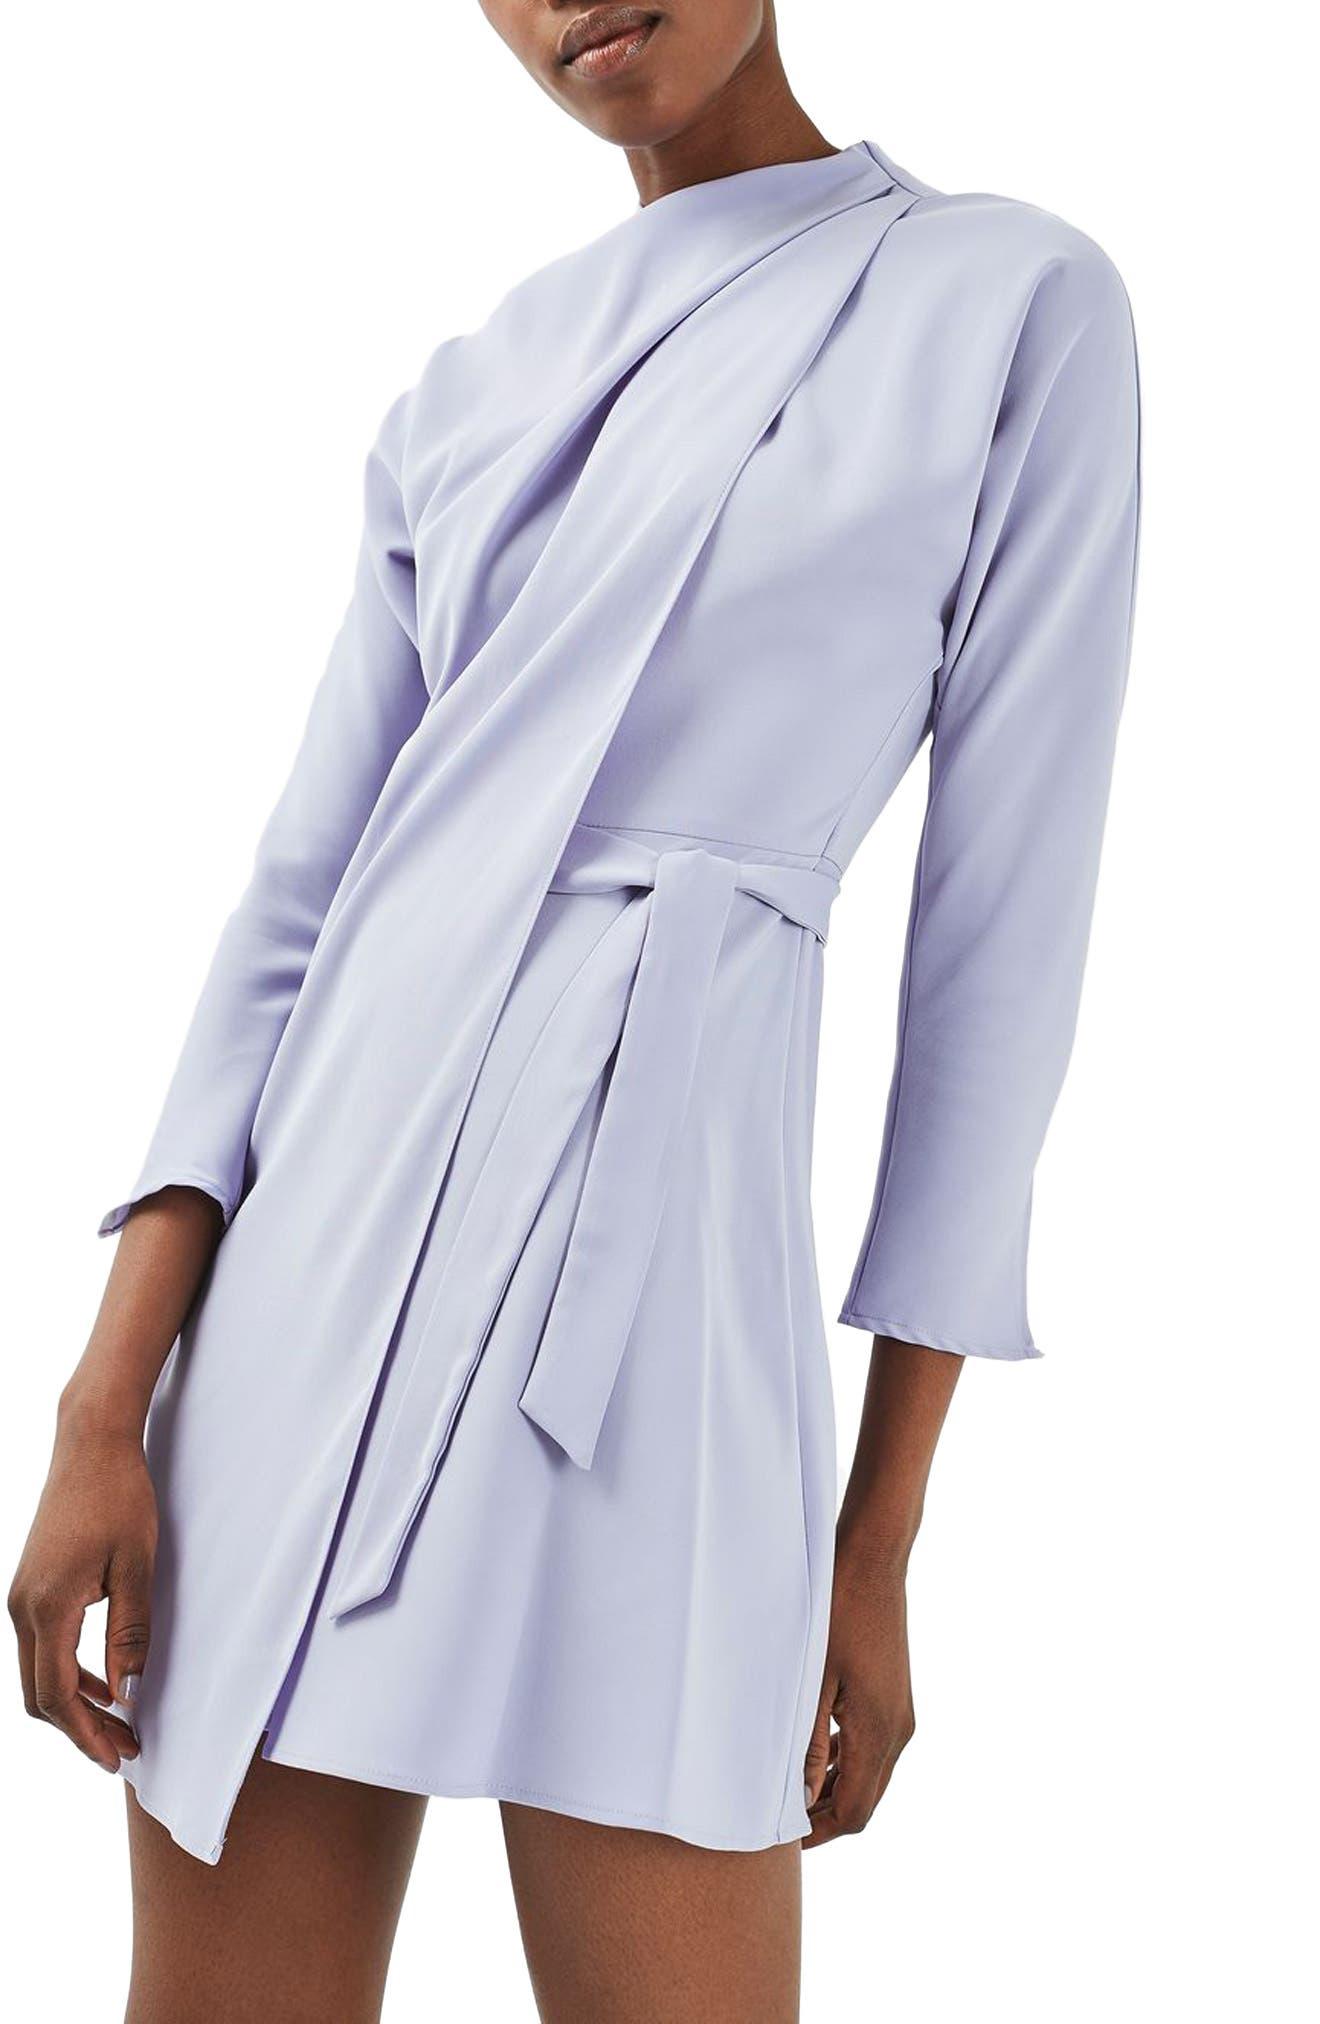 Alternate Image 1 Selected - Topshop Drape Neck Dress